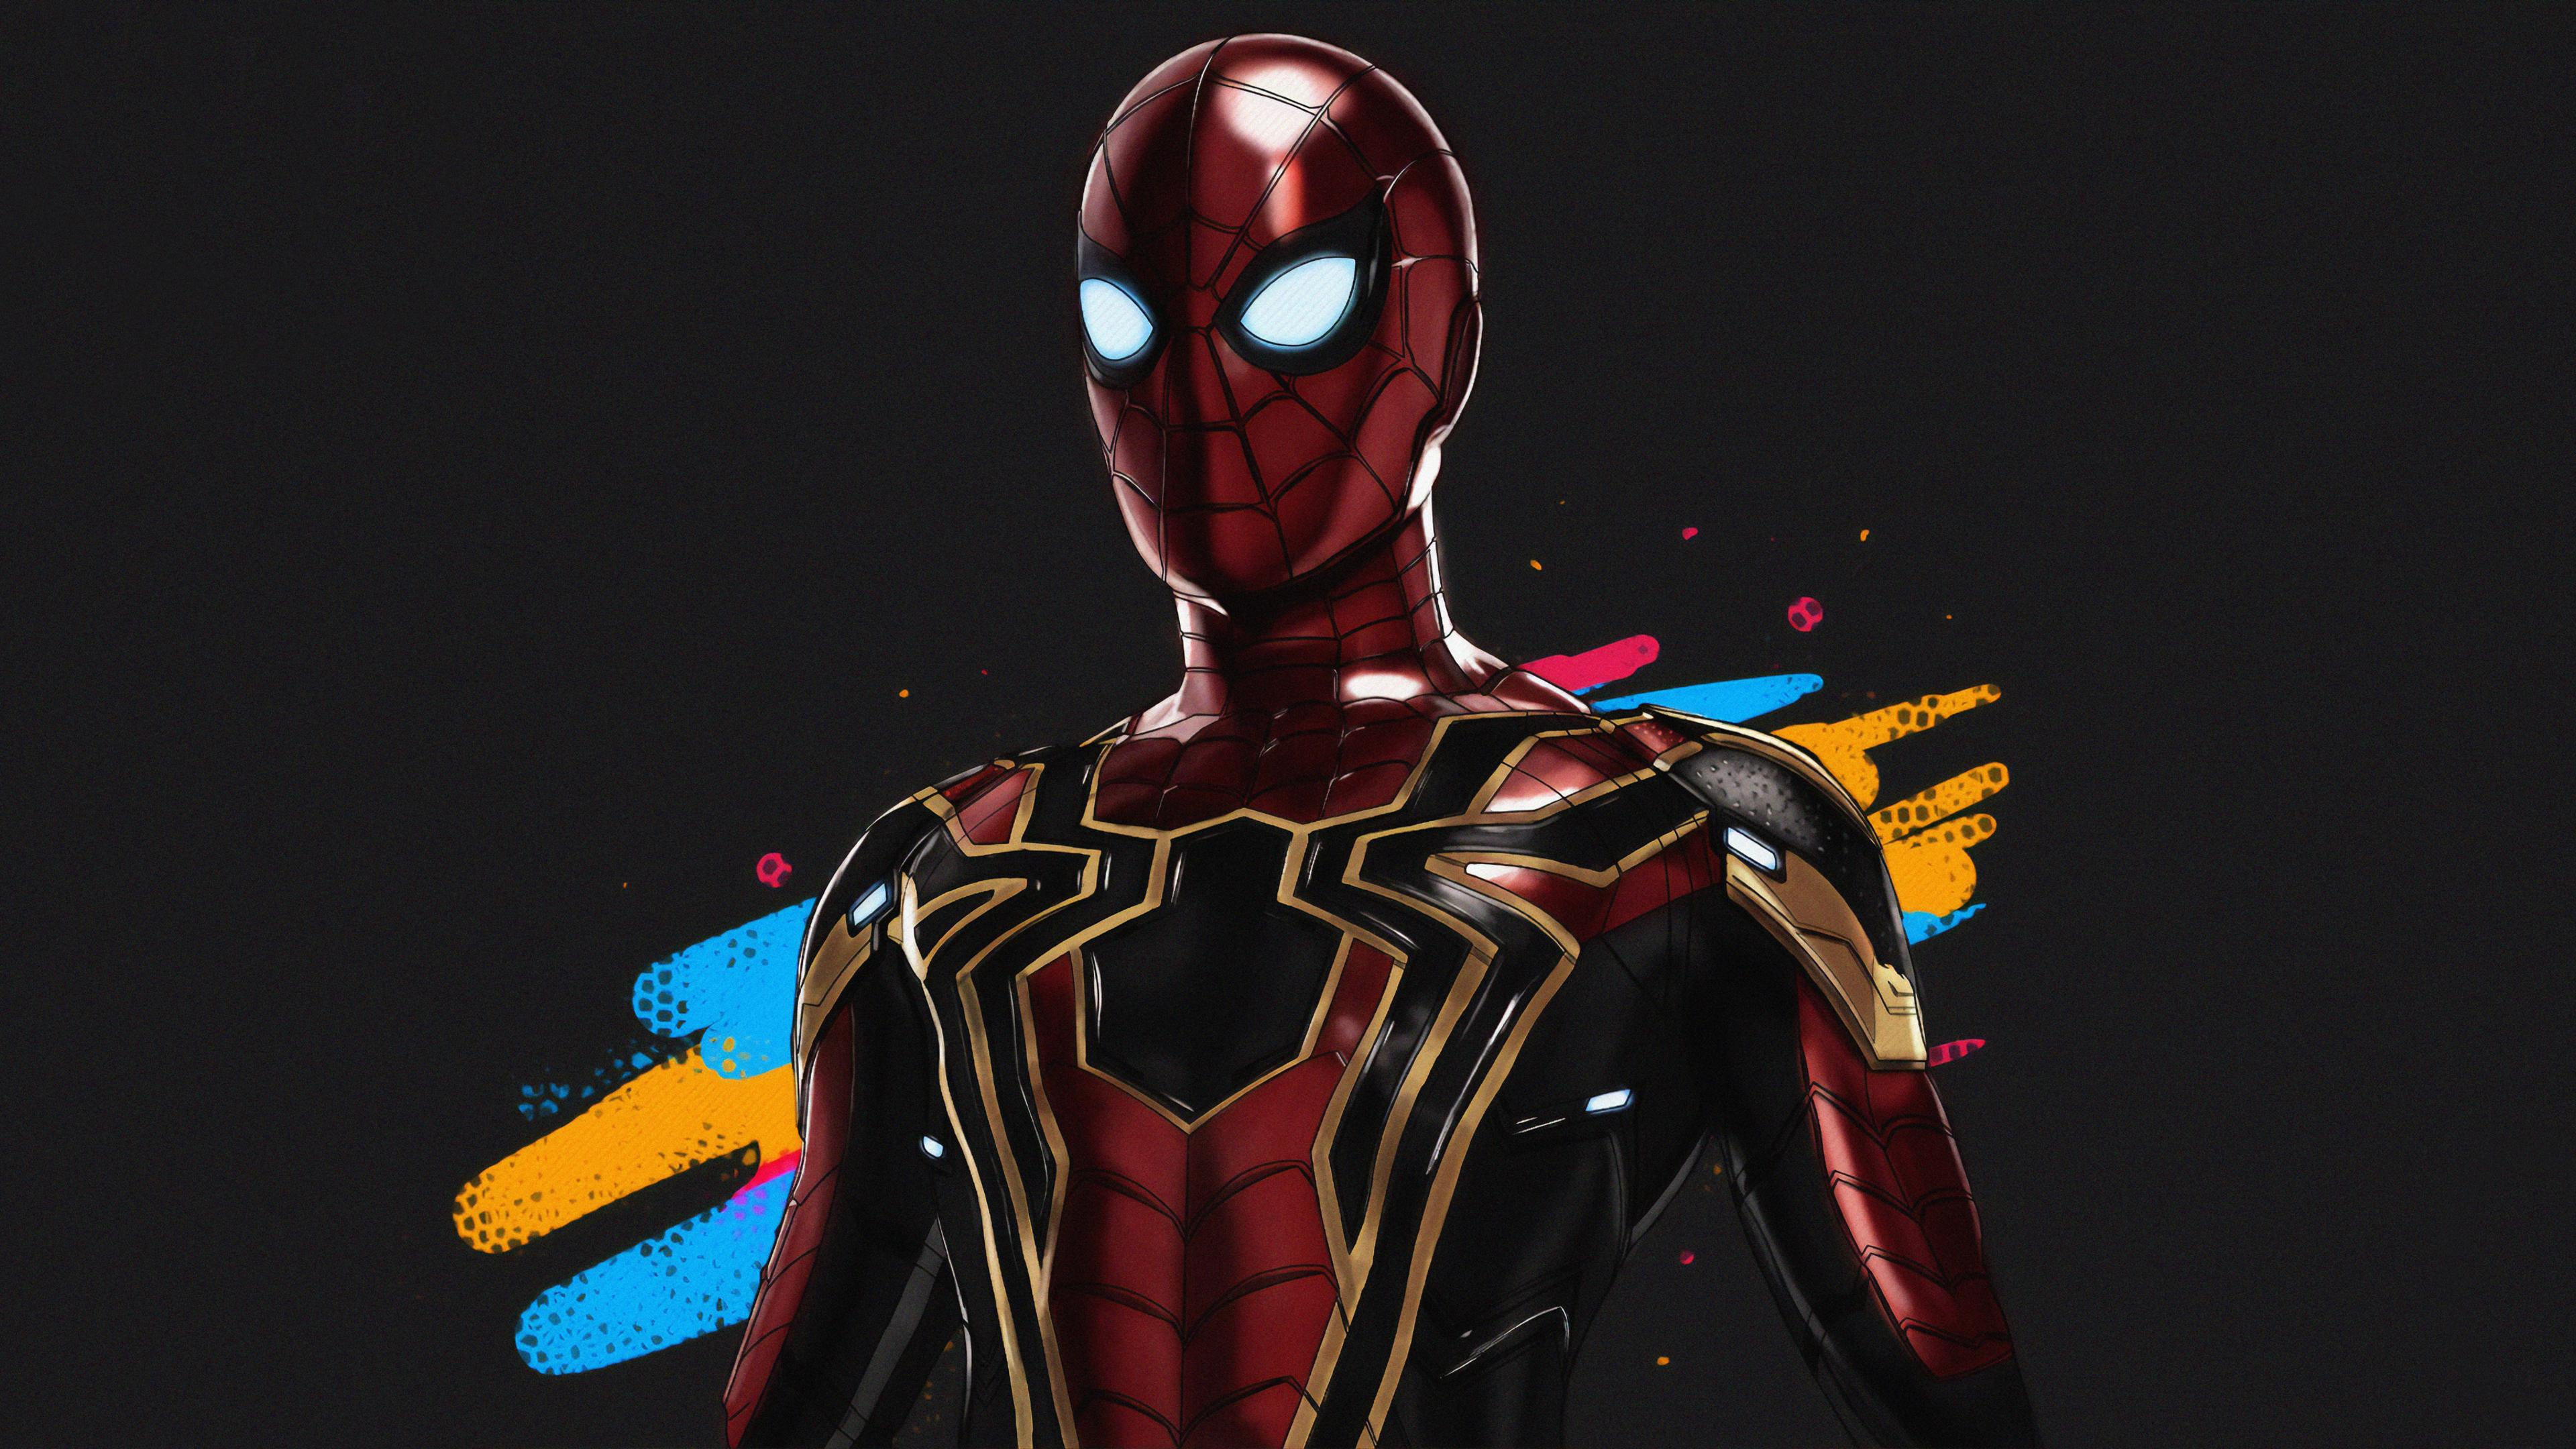 Wallpaper 4k Spiderman Iron Art 4k Wallpapers Art